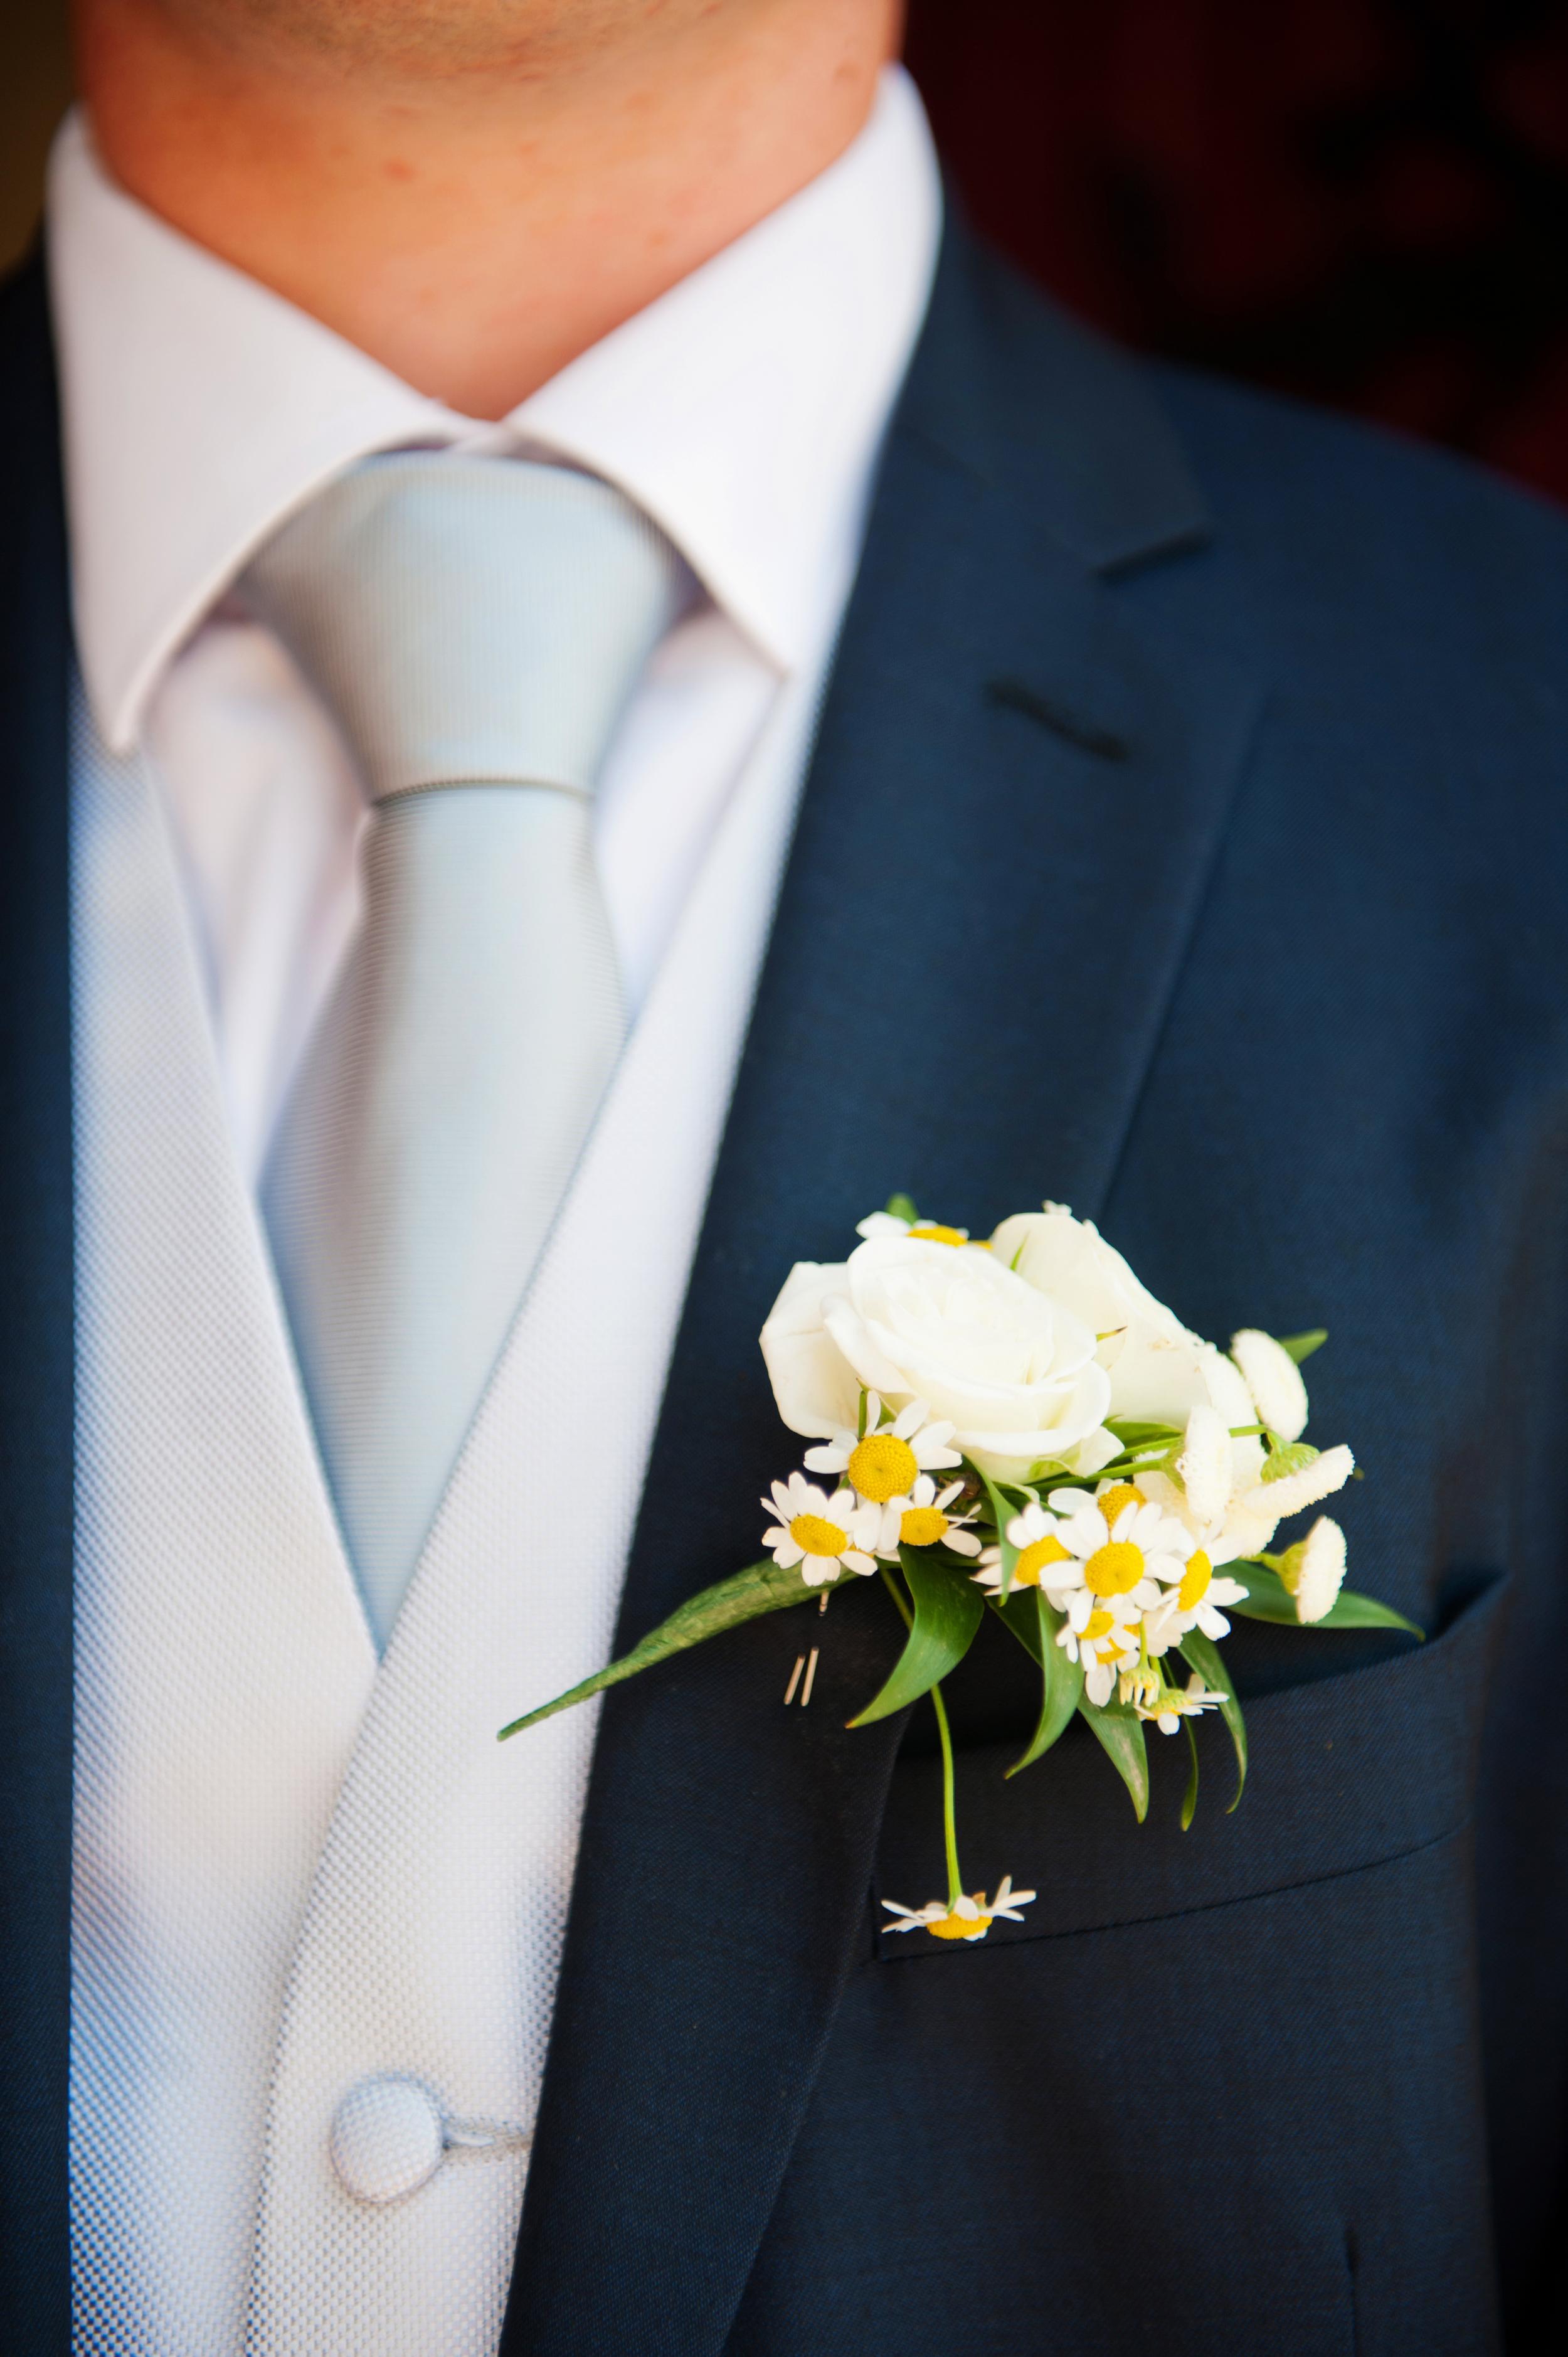 Flowers by Michelle of Cashel Flowers -Photography:  Weddings by KARA  © - Wedding Location: Kilshane House, Tipperary, Ireland